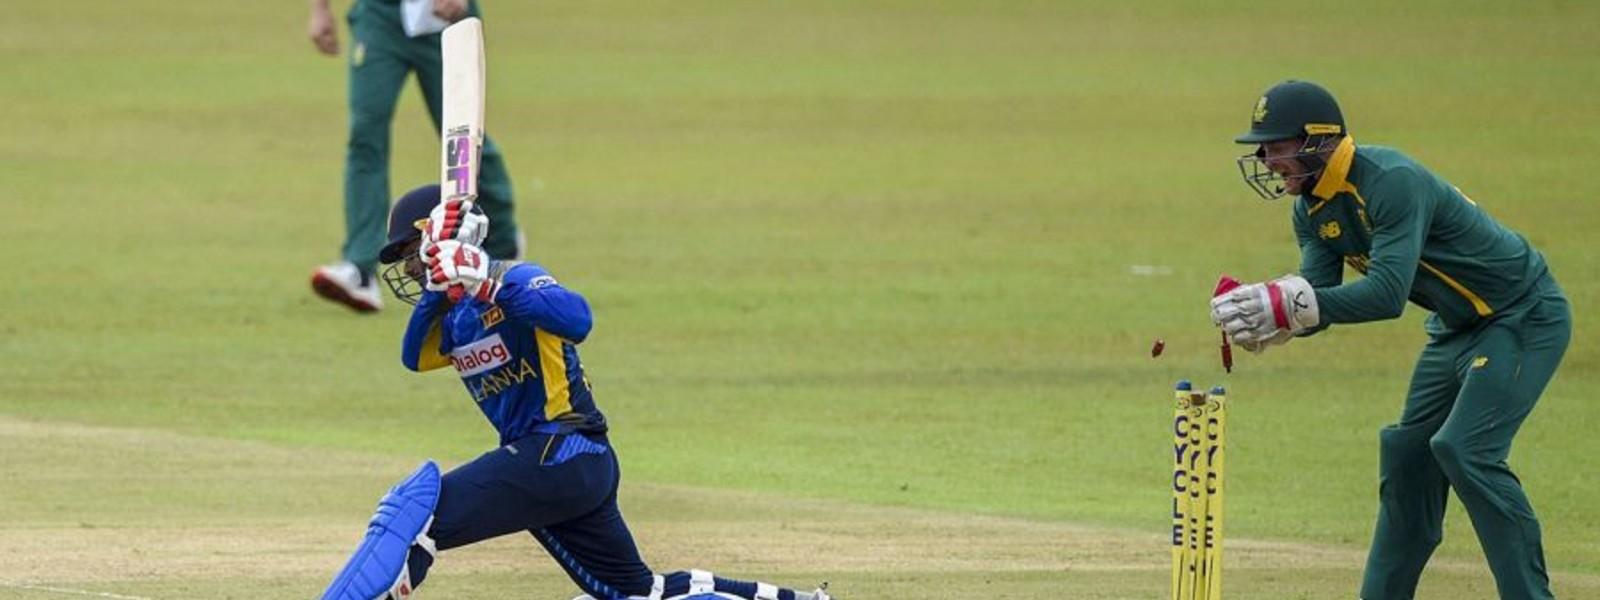 Malan shines as South Africa defeat Sri Lanka by 67 runs (DLS method)